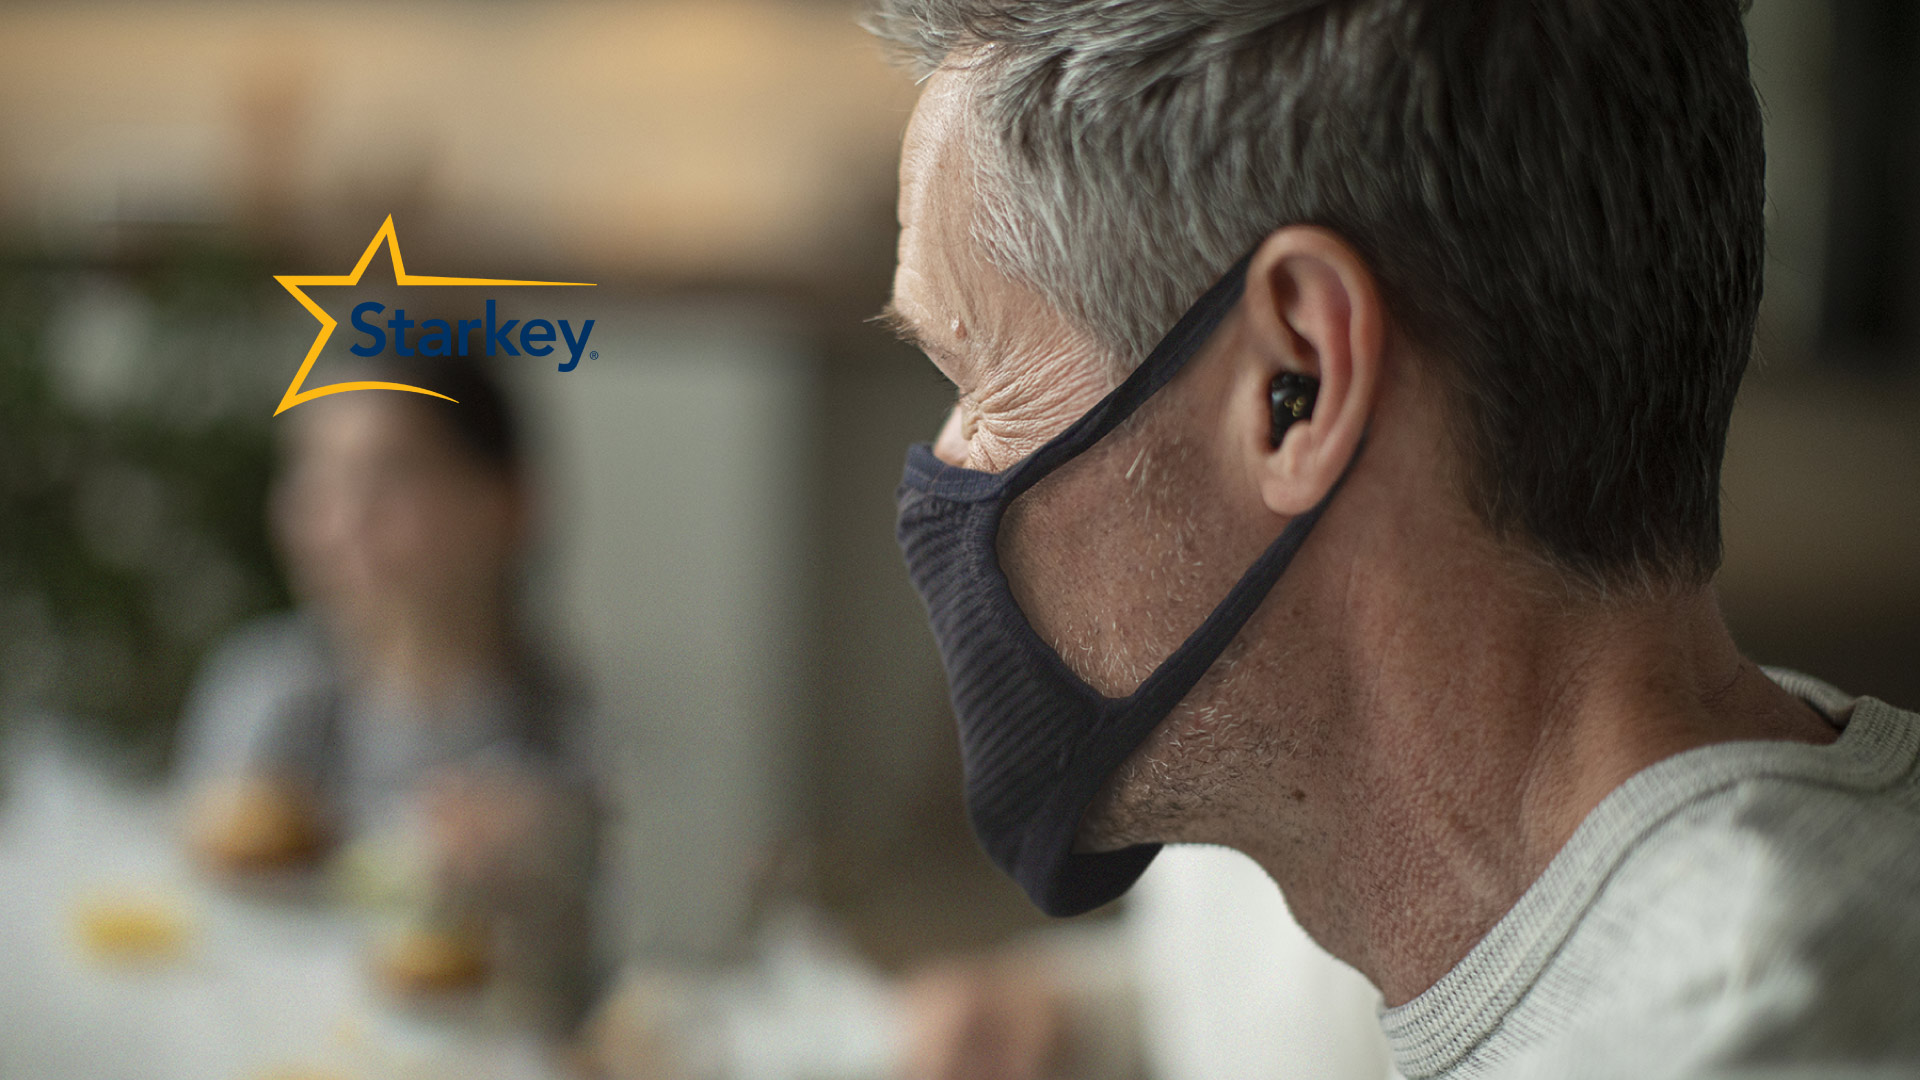 Starkey Livio Edge AI doesn't interfere with face masks